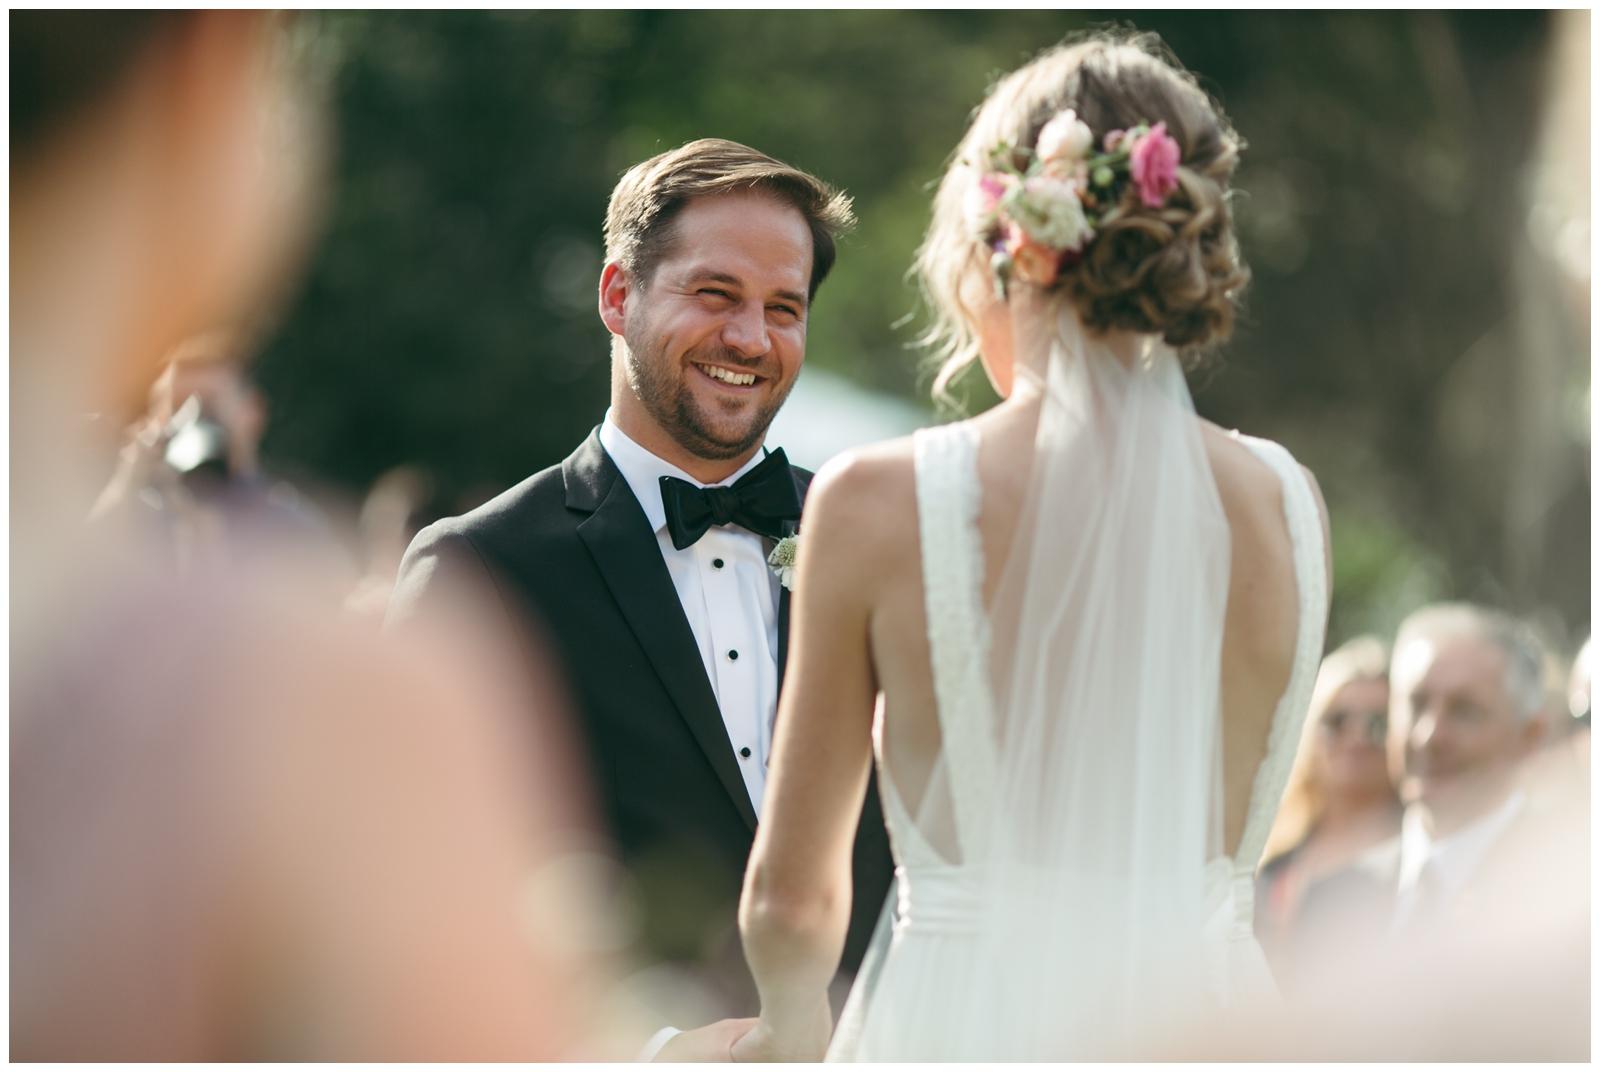 Moraine-Farm-wedding-Bailey-Q-Photo-Massachusetts-wedding-photpgrapher-069.jpg